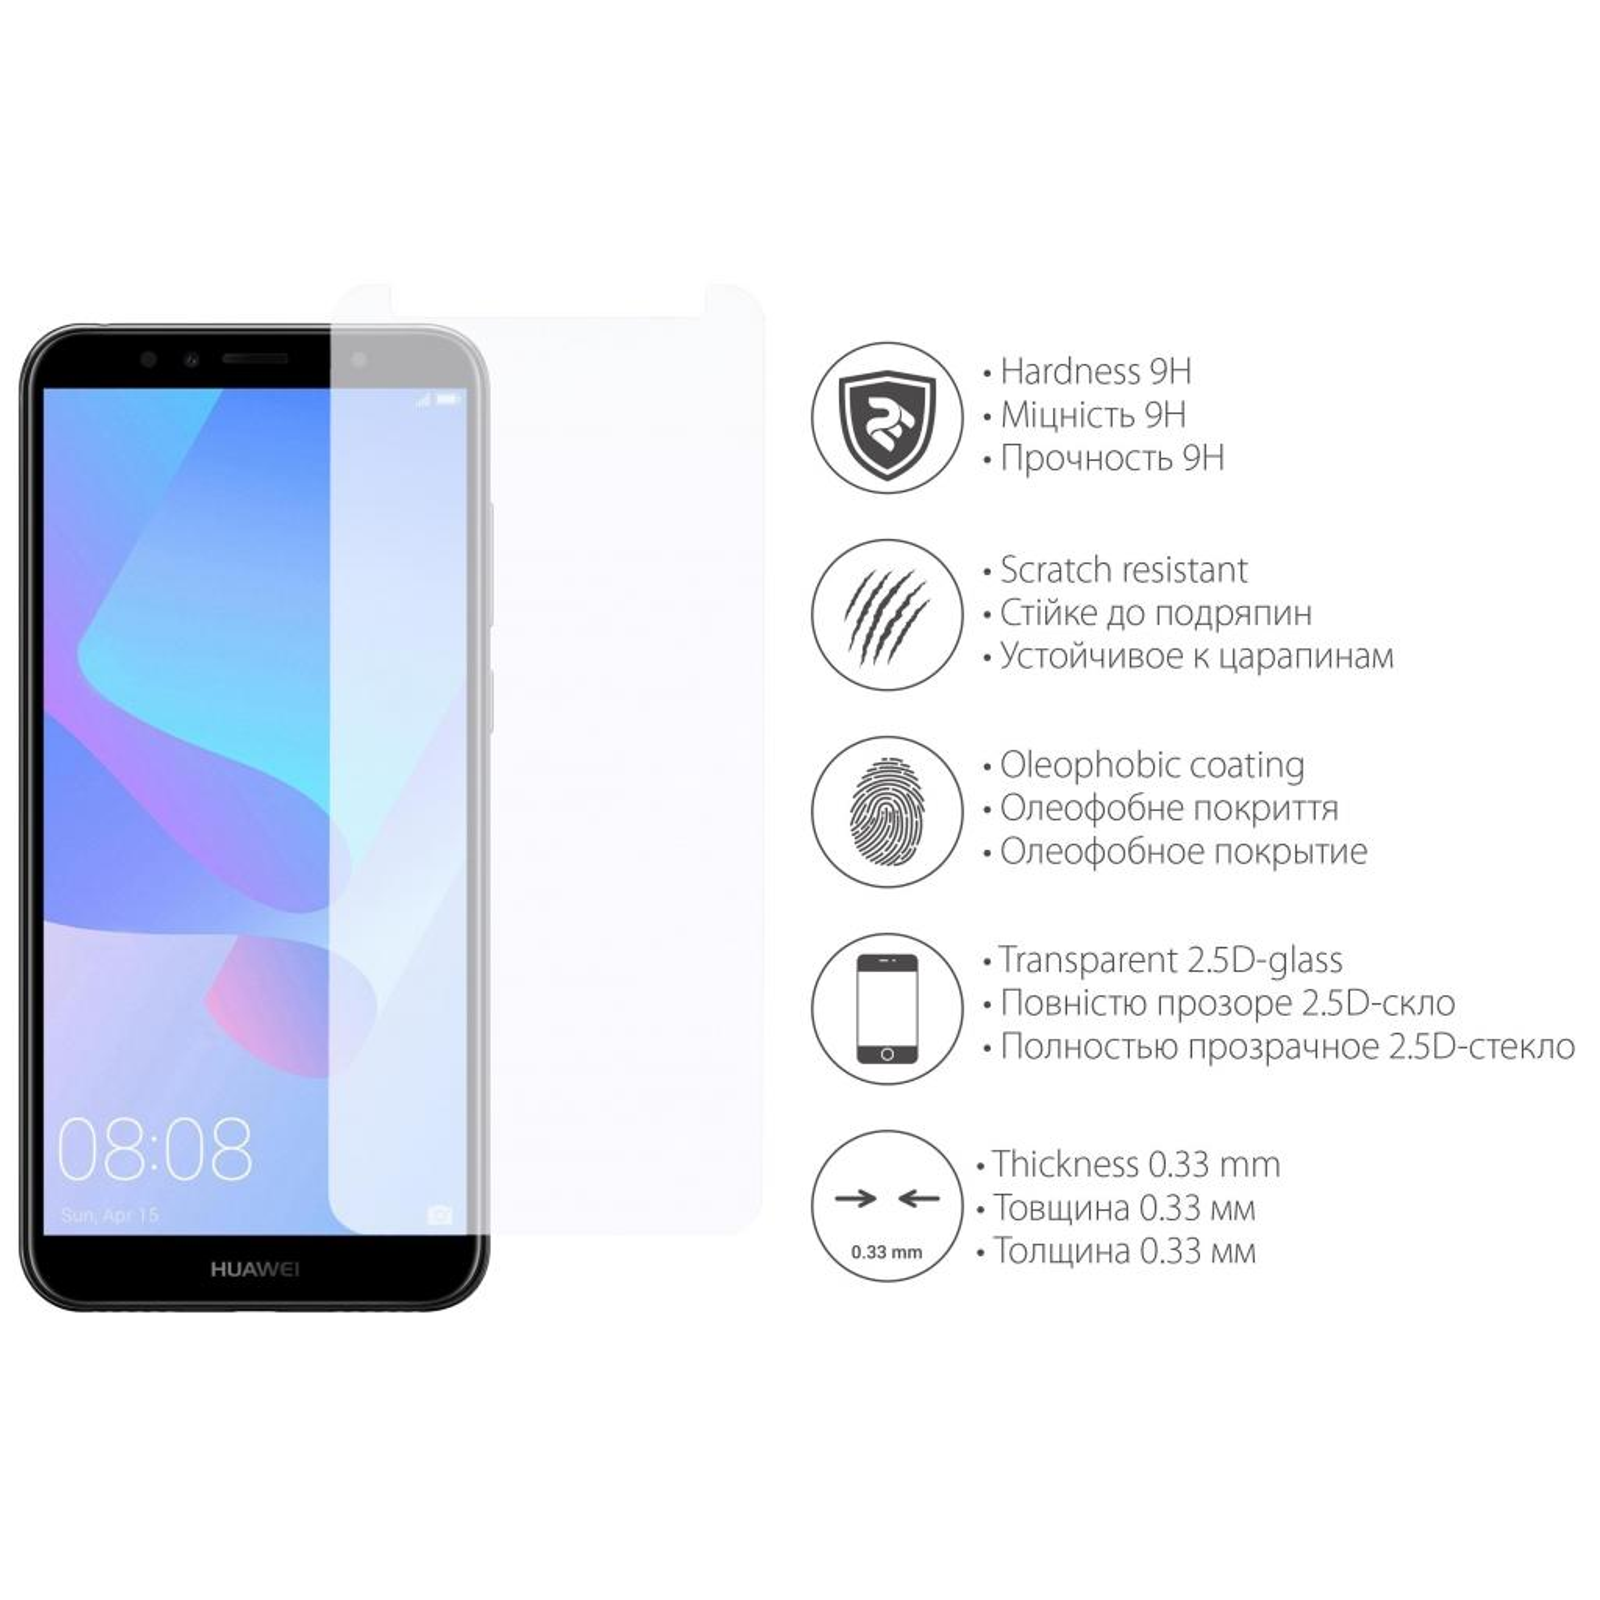 Стекло защитное 2E для Huawei Y7 Prime 2018 2.5D Clear (2E-TGHW-Y7P18-25D) изображение 3